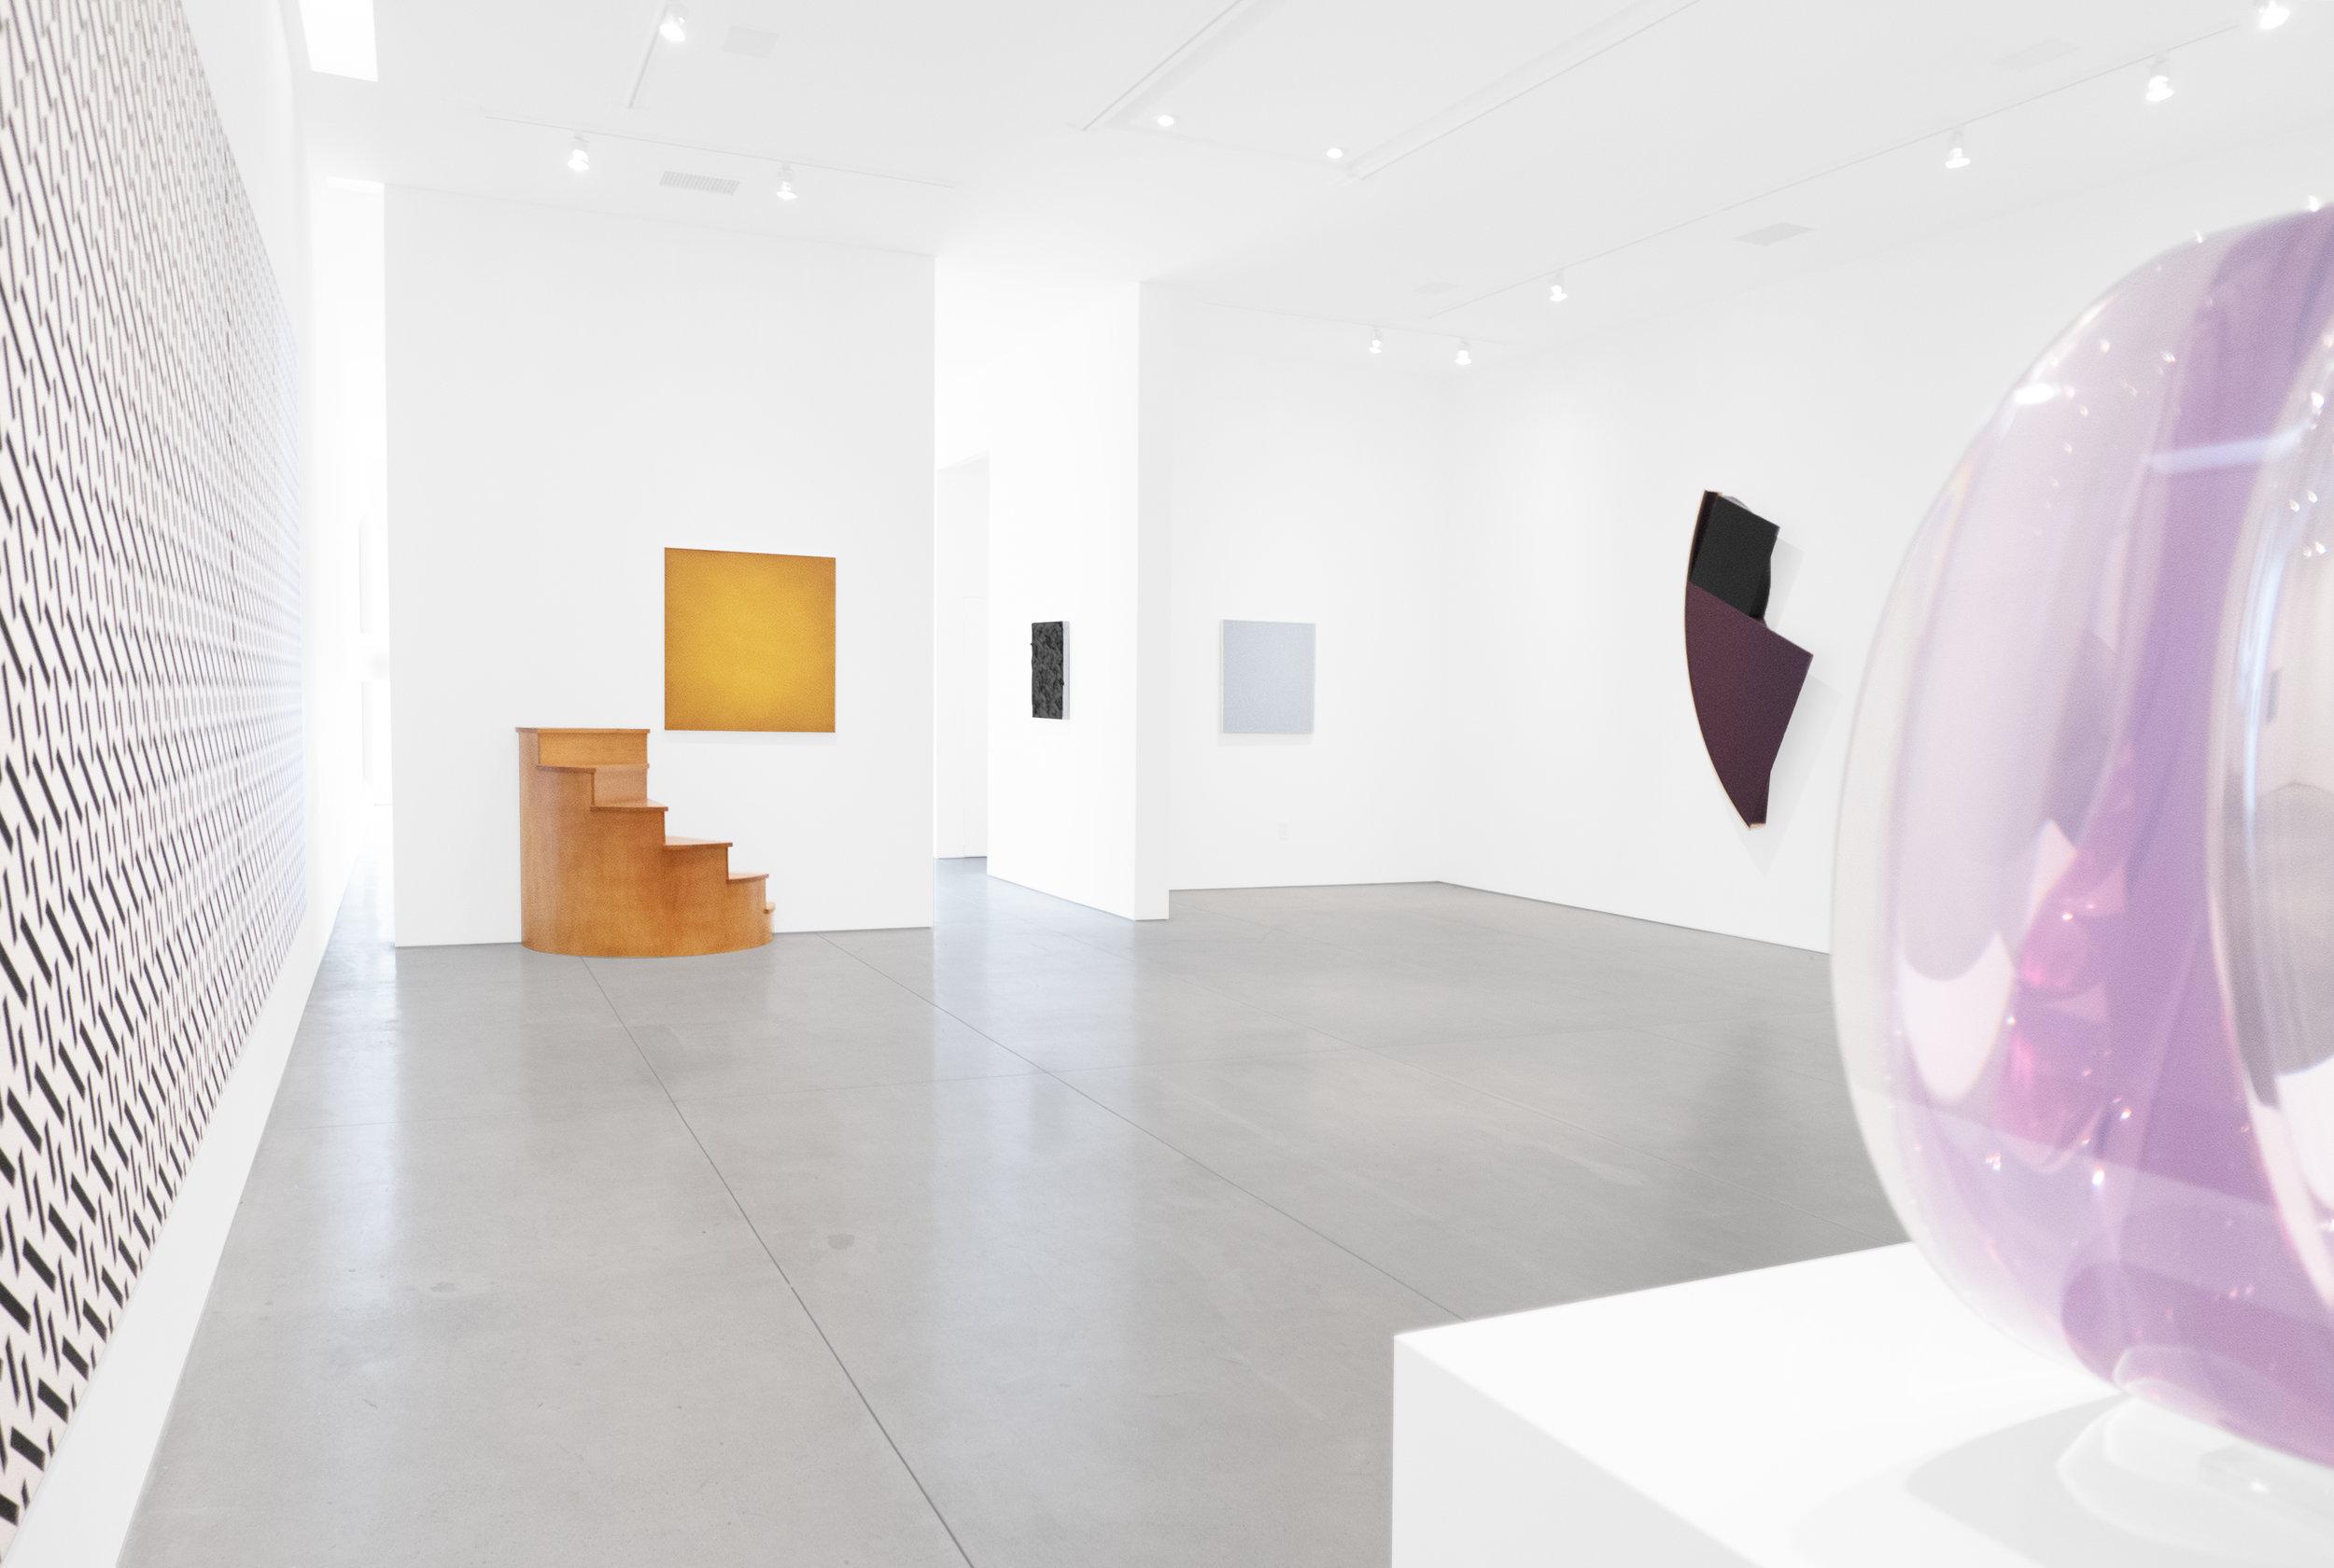 25 Years_Peter Blake Gallery_2019_Installation View_30.jpg